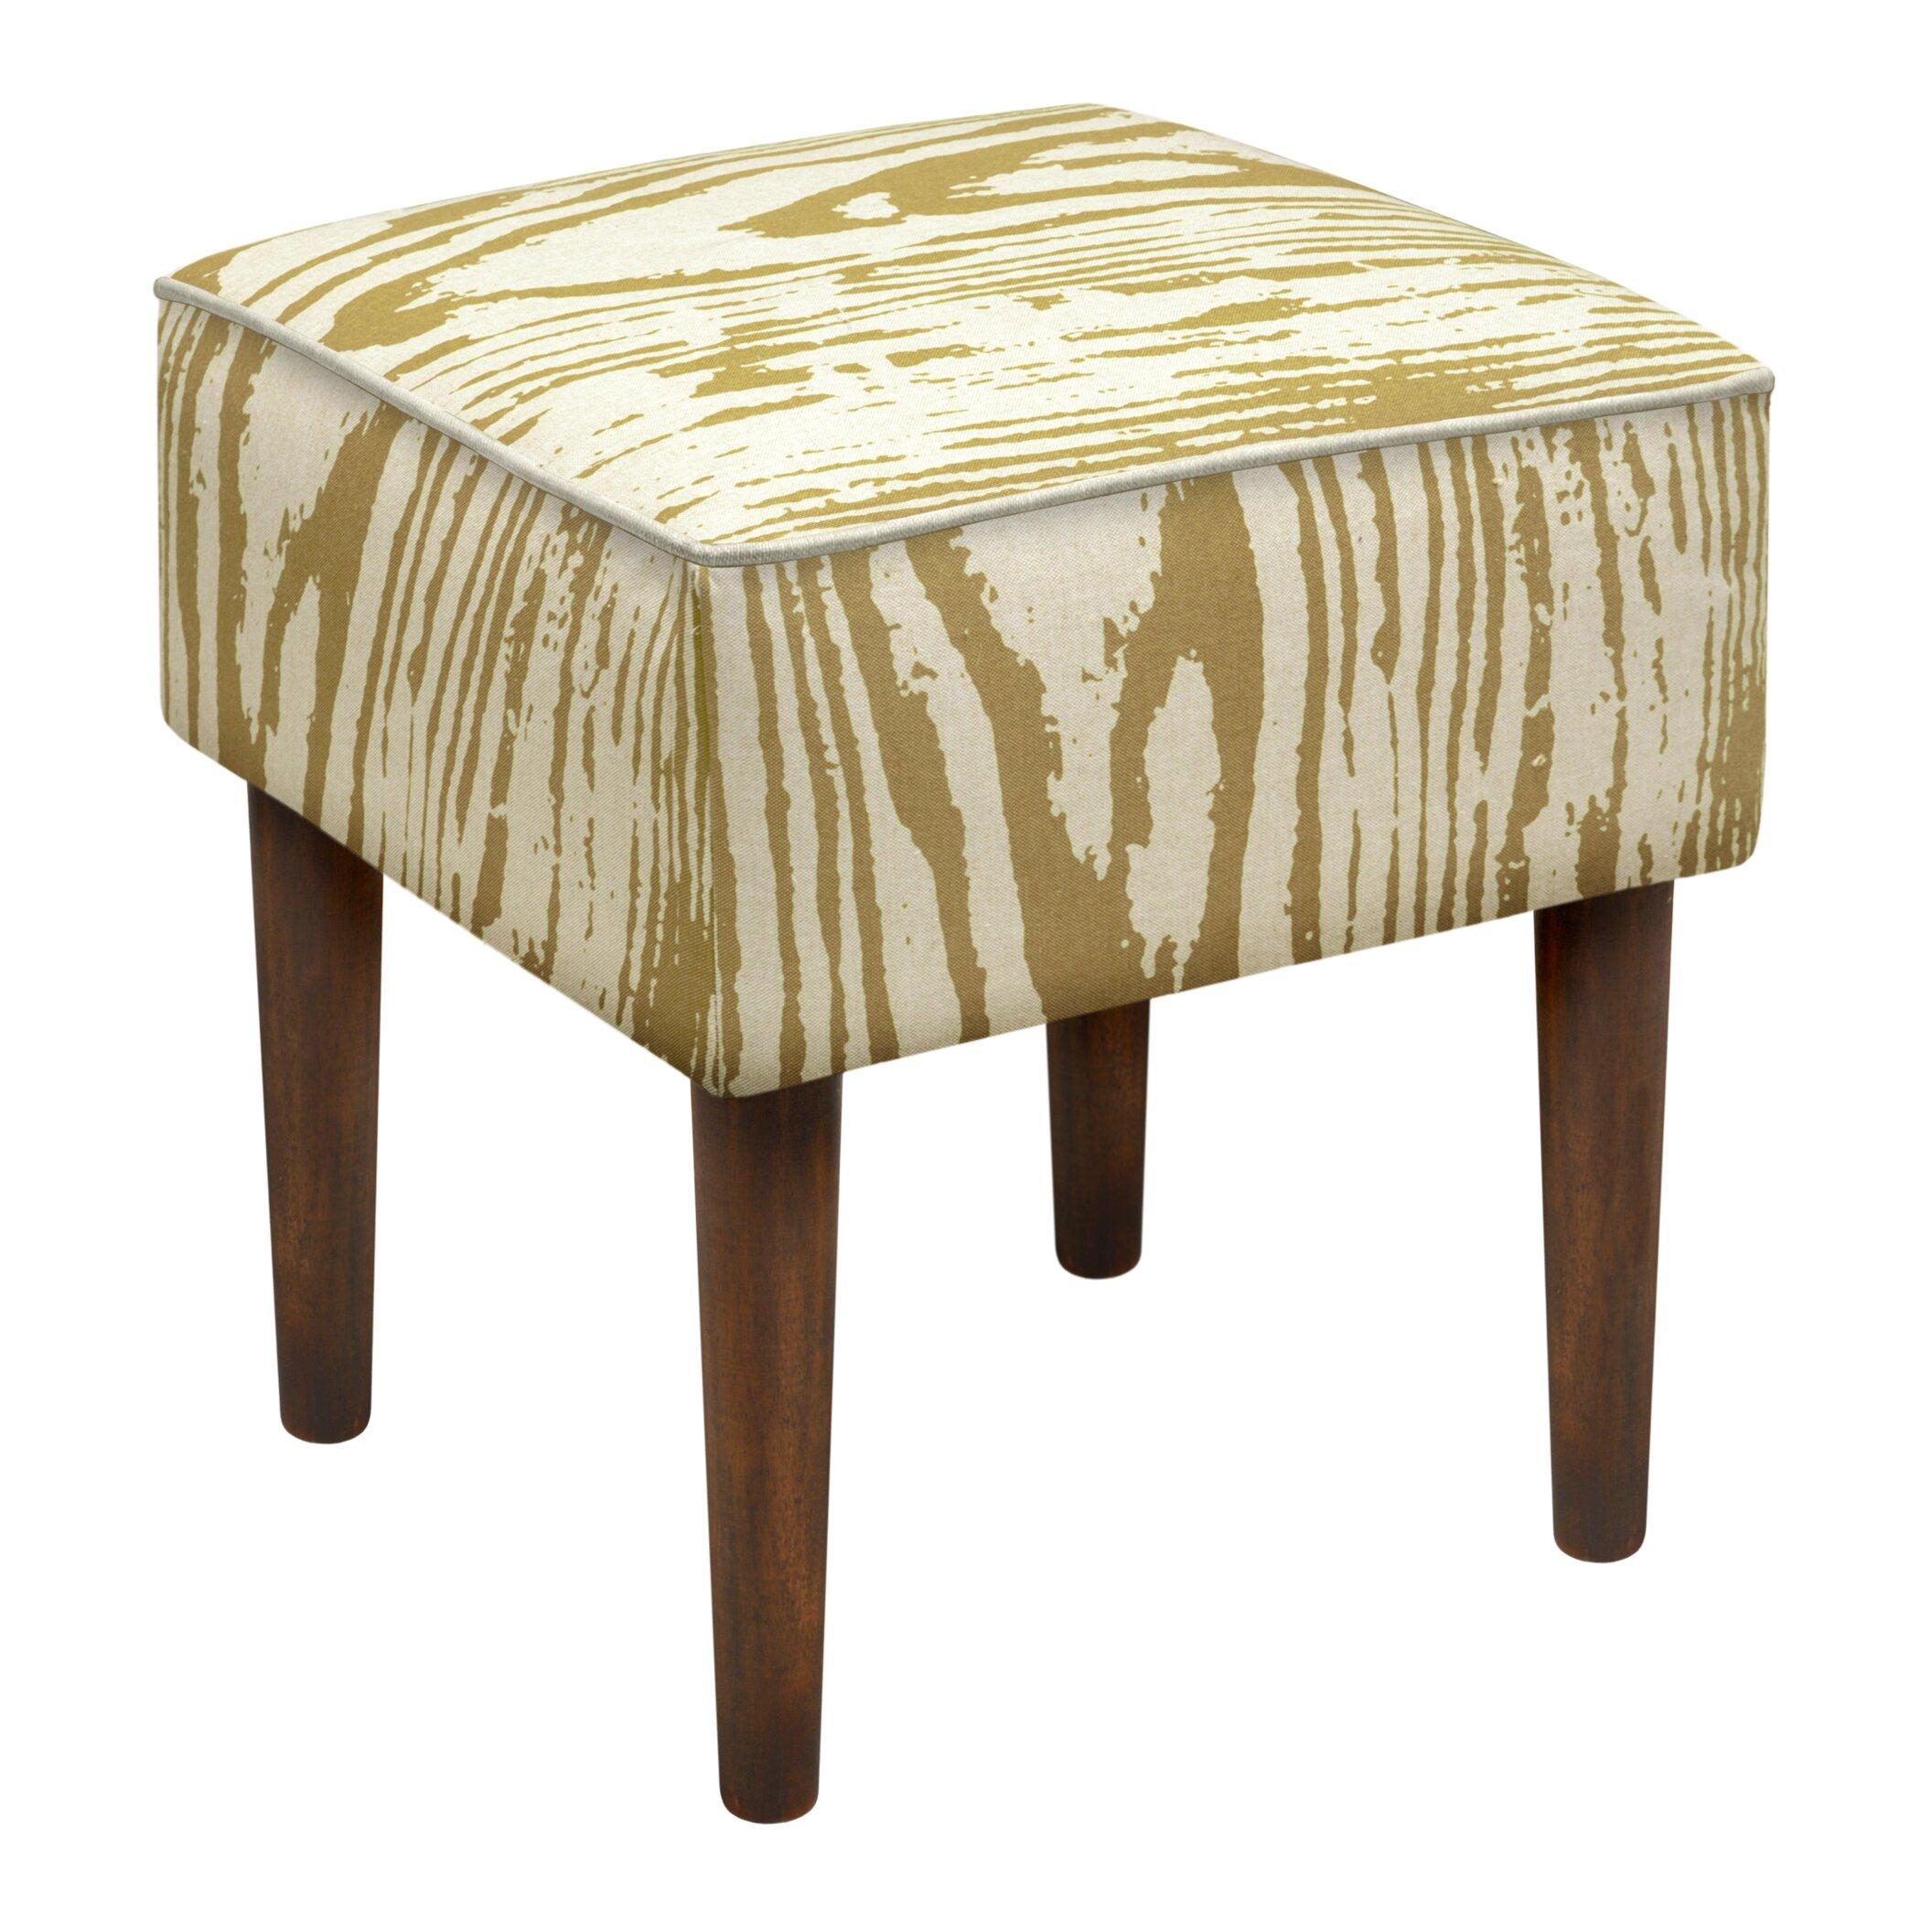 123 Creations Faux Bois Upholstered Vanity Stool Wayfair